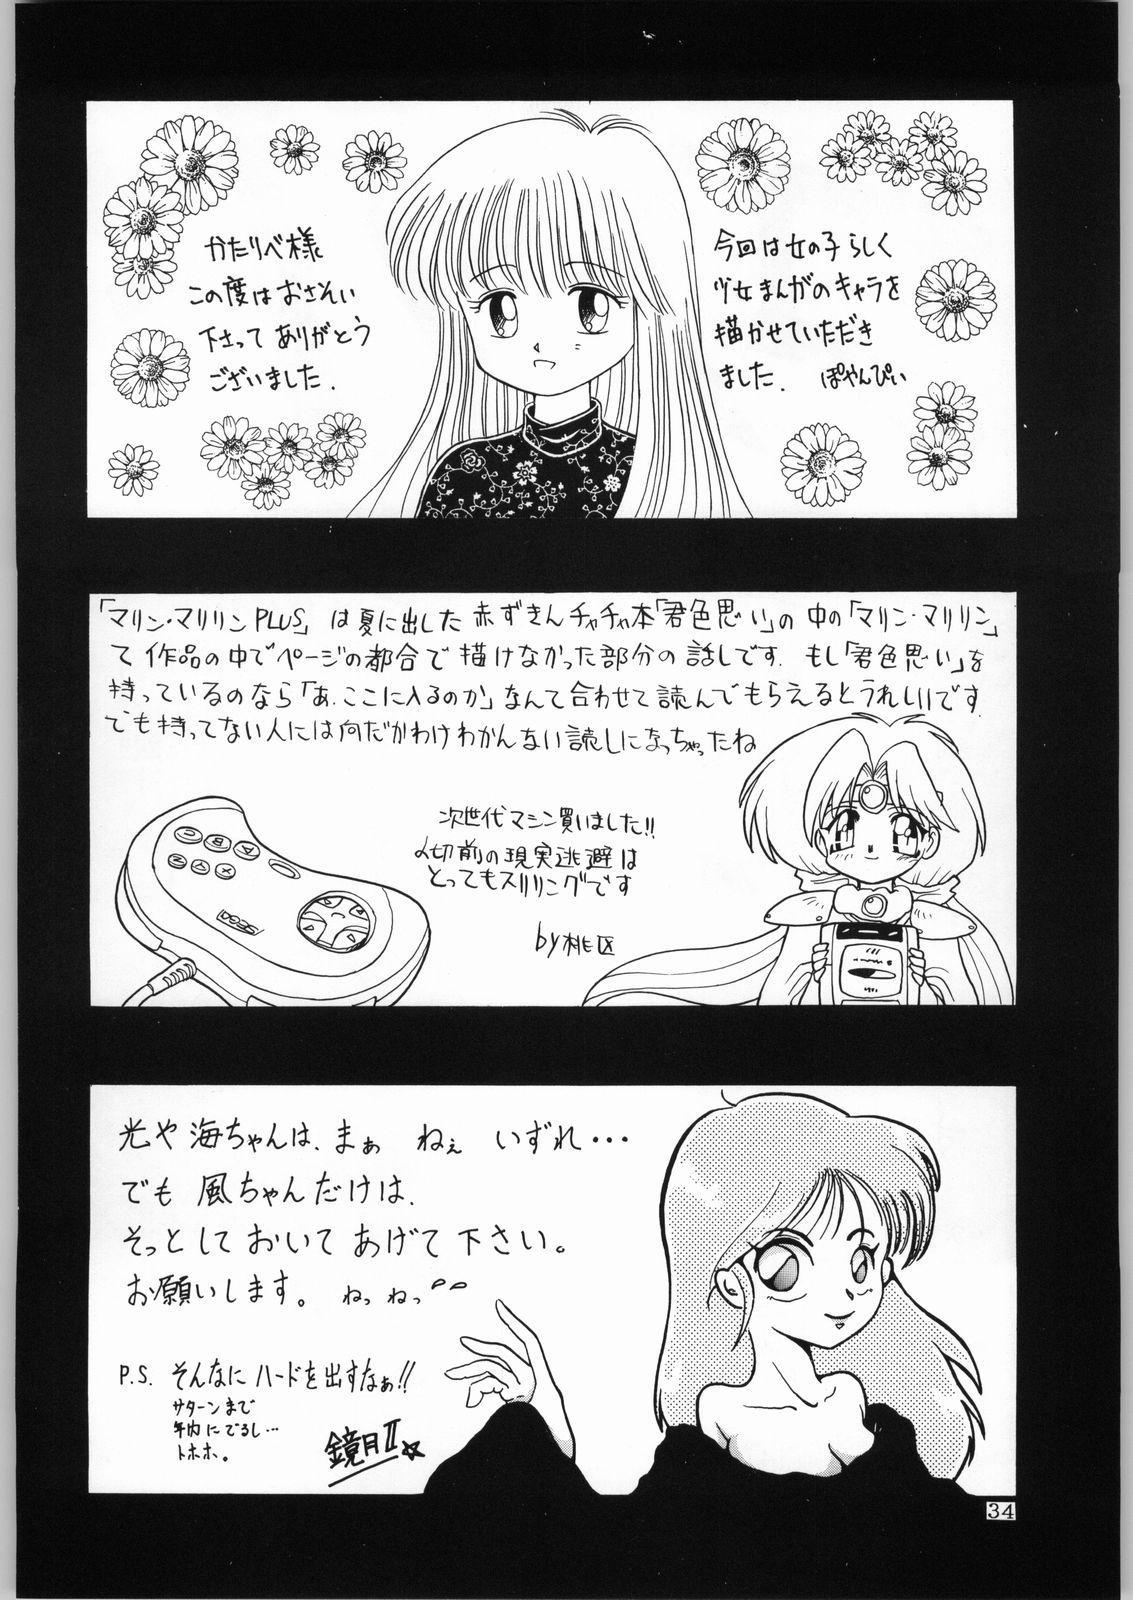 Dance of Princess 4 32